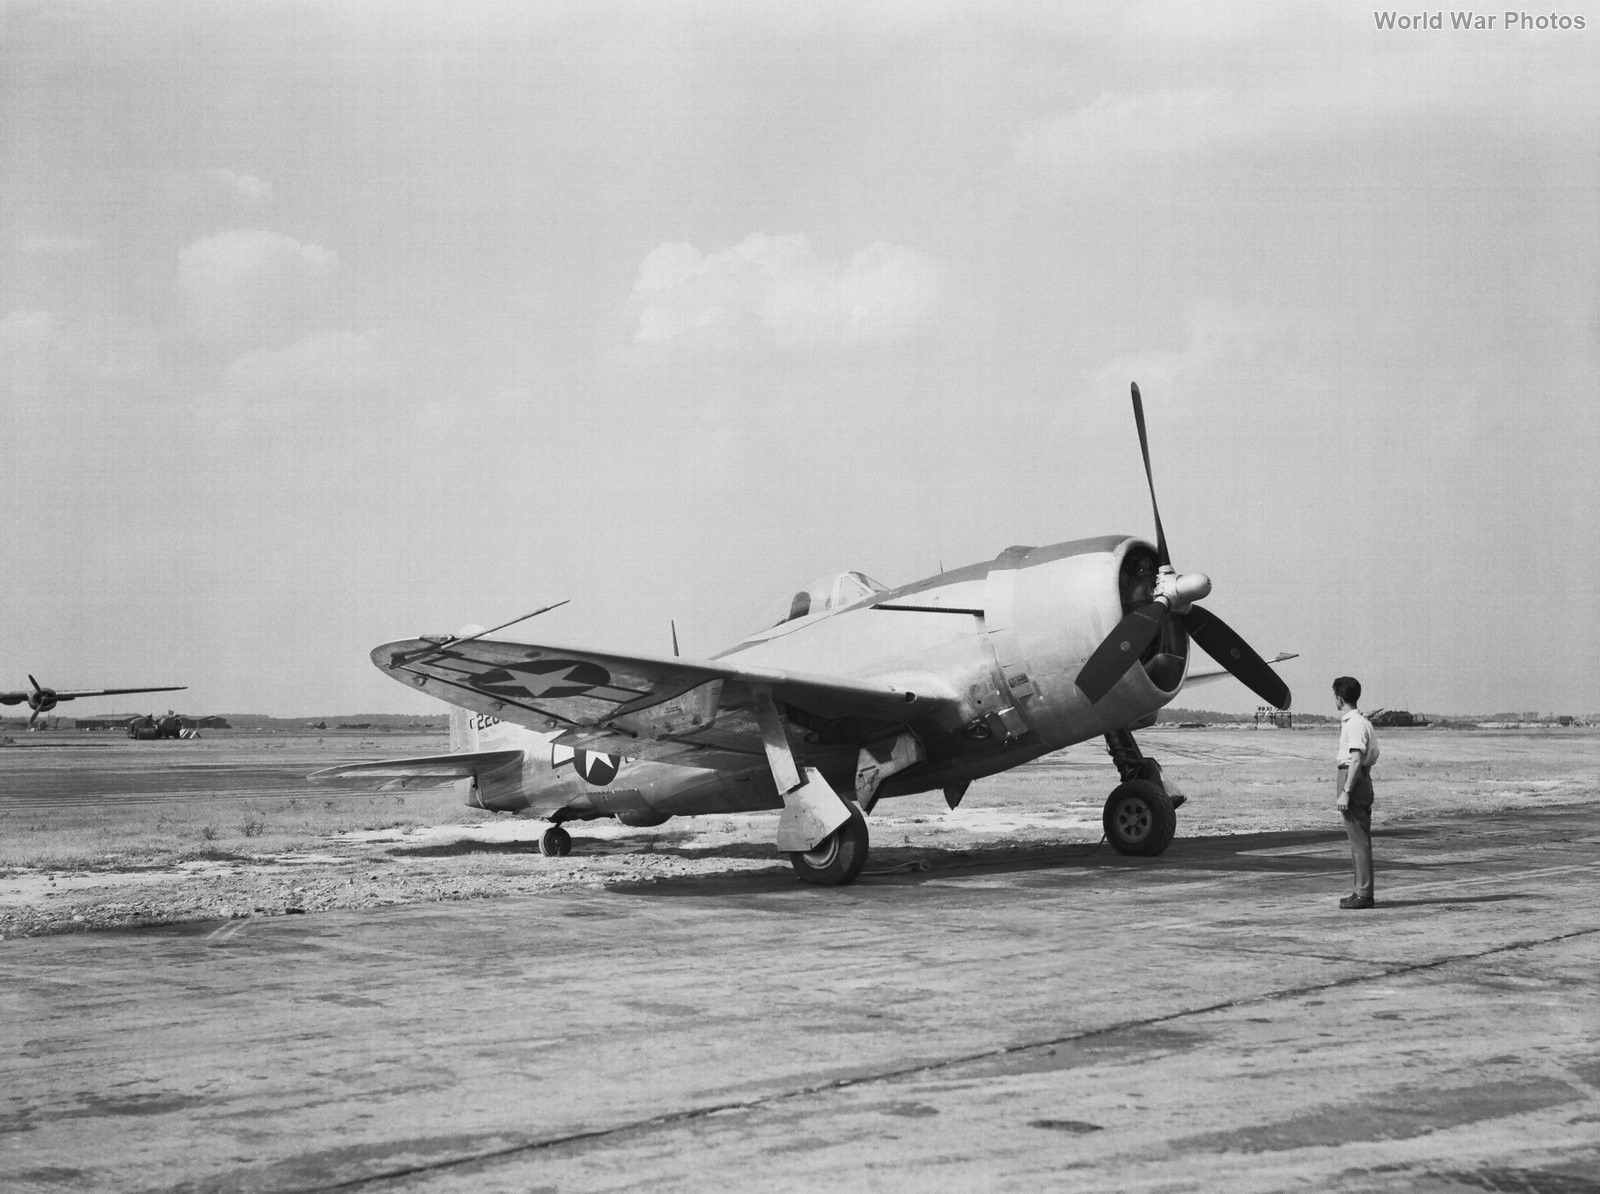 P-47 test